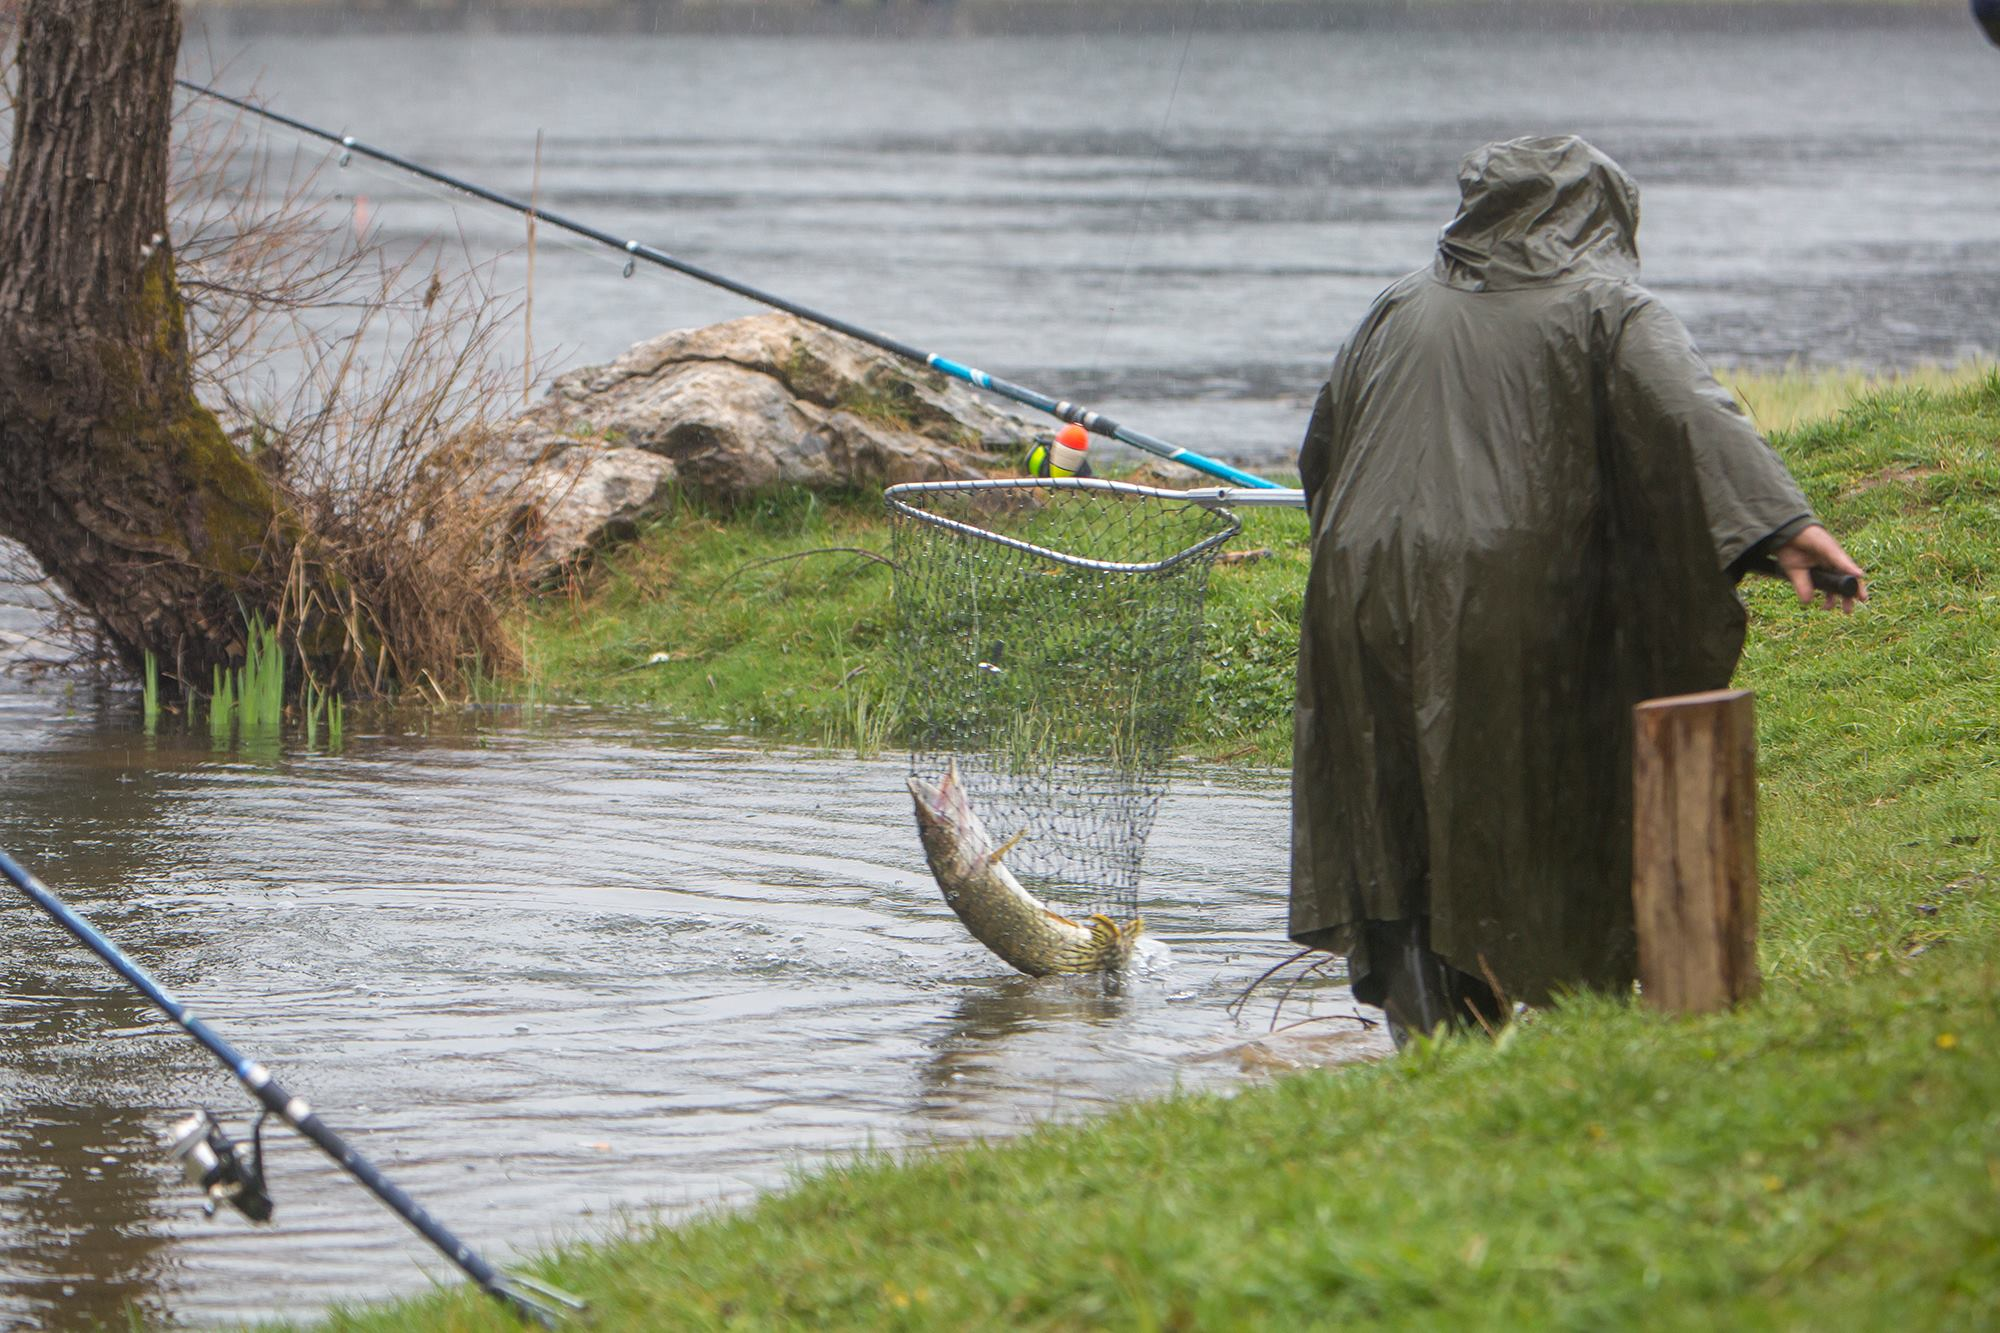 Štukijada, ribolov, snimio Marin SMOLČIĆ